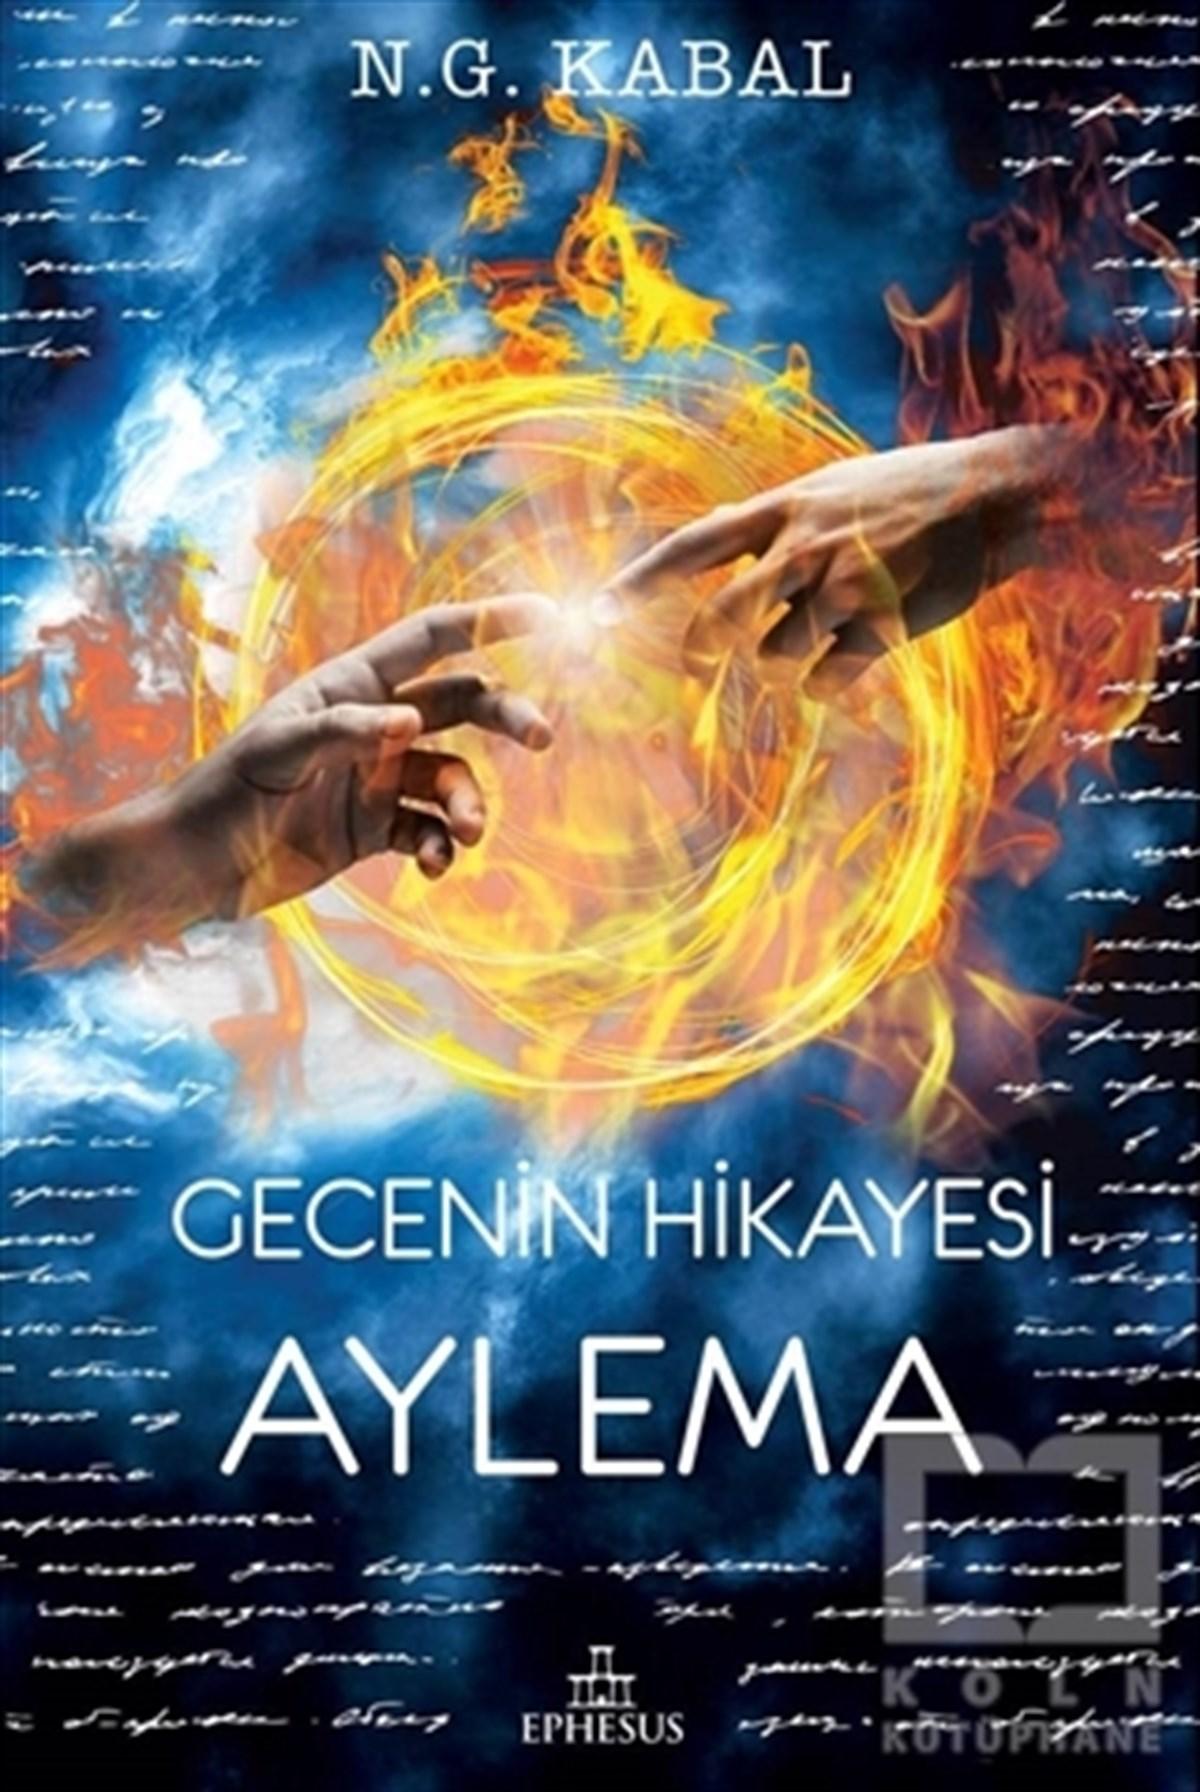 Gecenin Hikayesi - Aylema (Ciltli) (SAHAF)